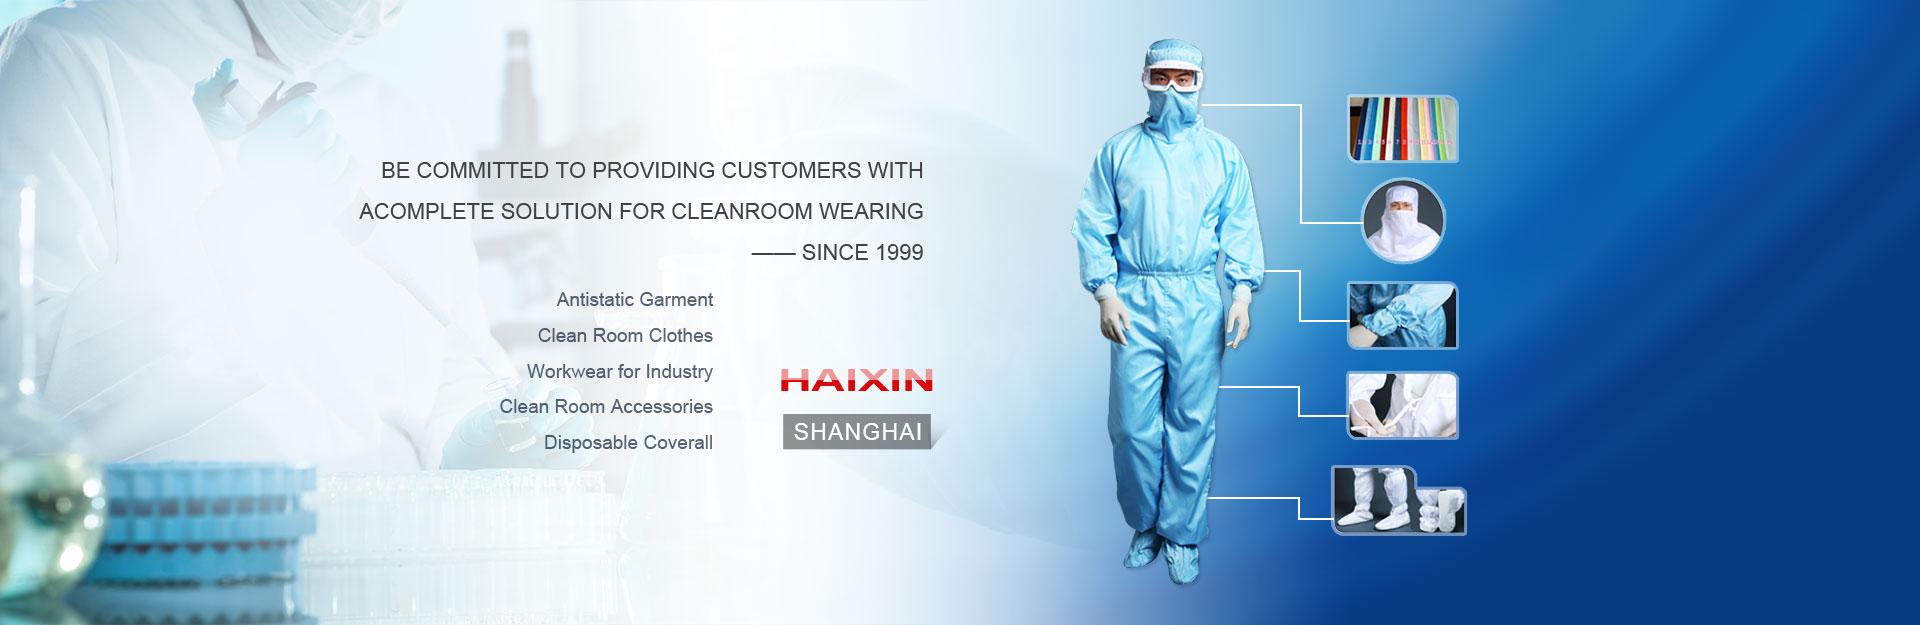 Cleanroom garment_esd safety shoes_workwear_Shanghai HaiXin